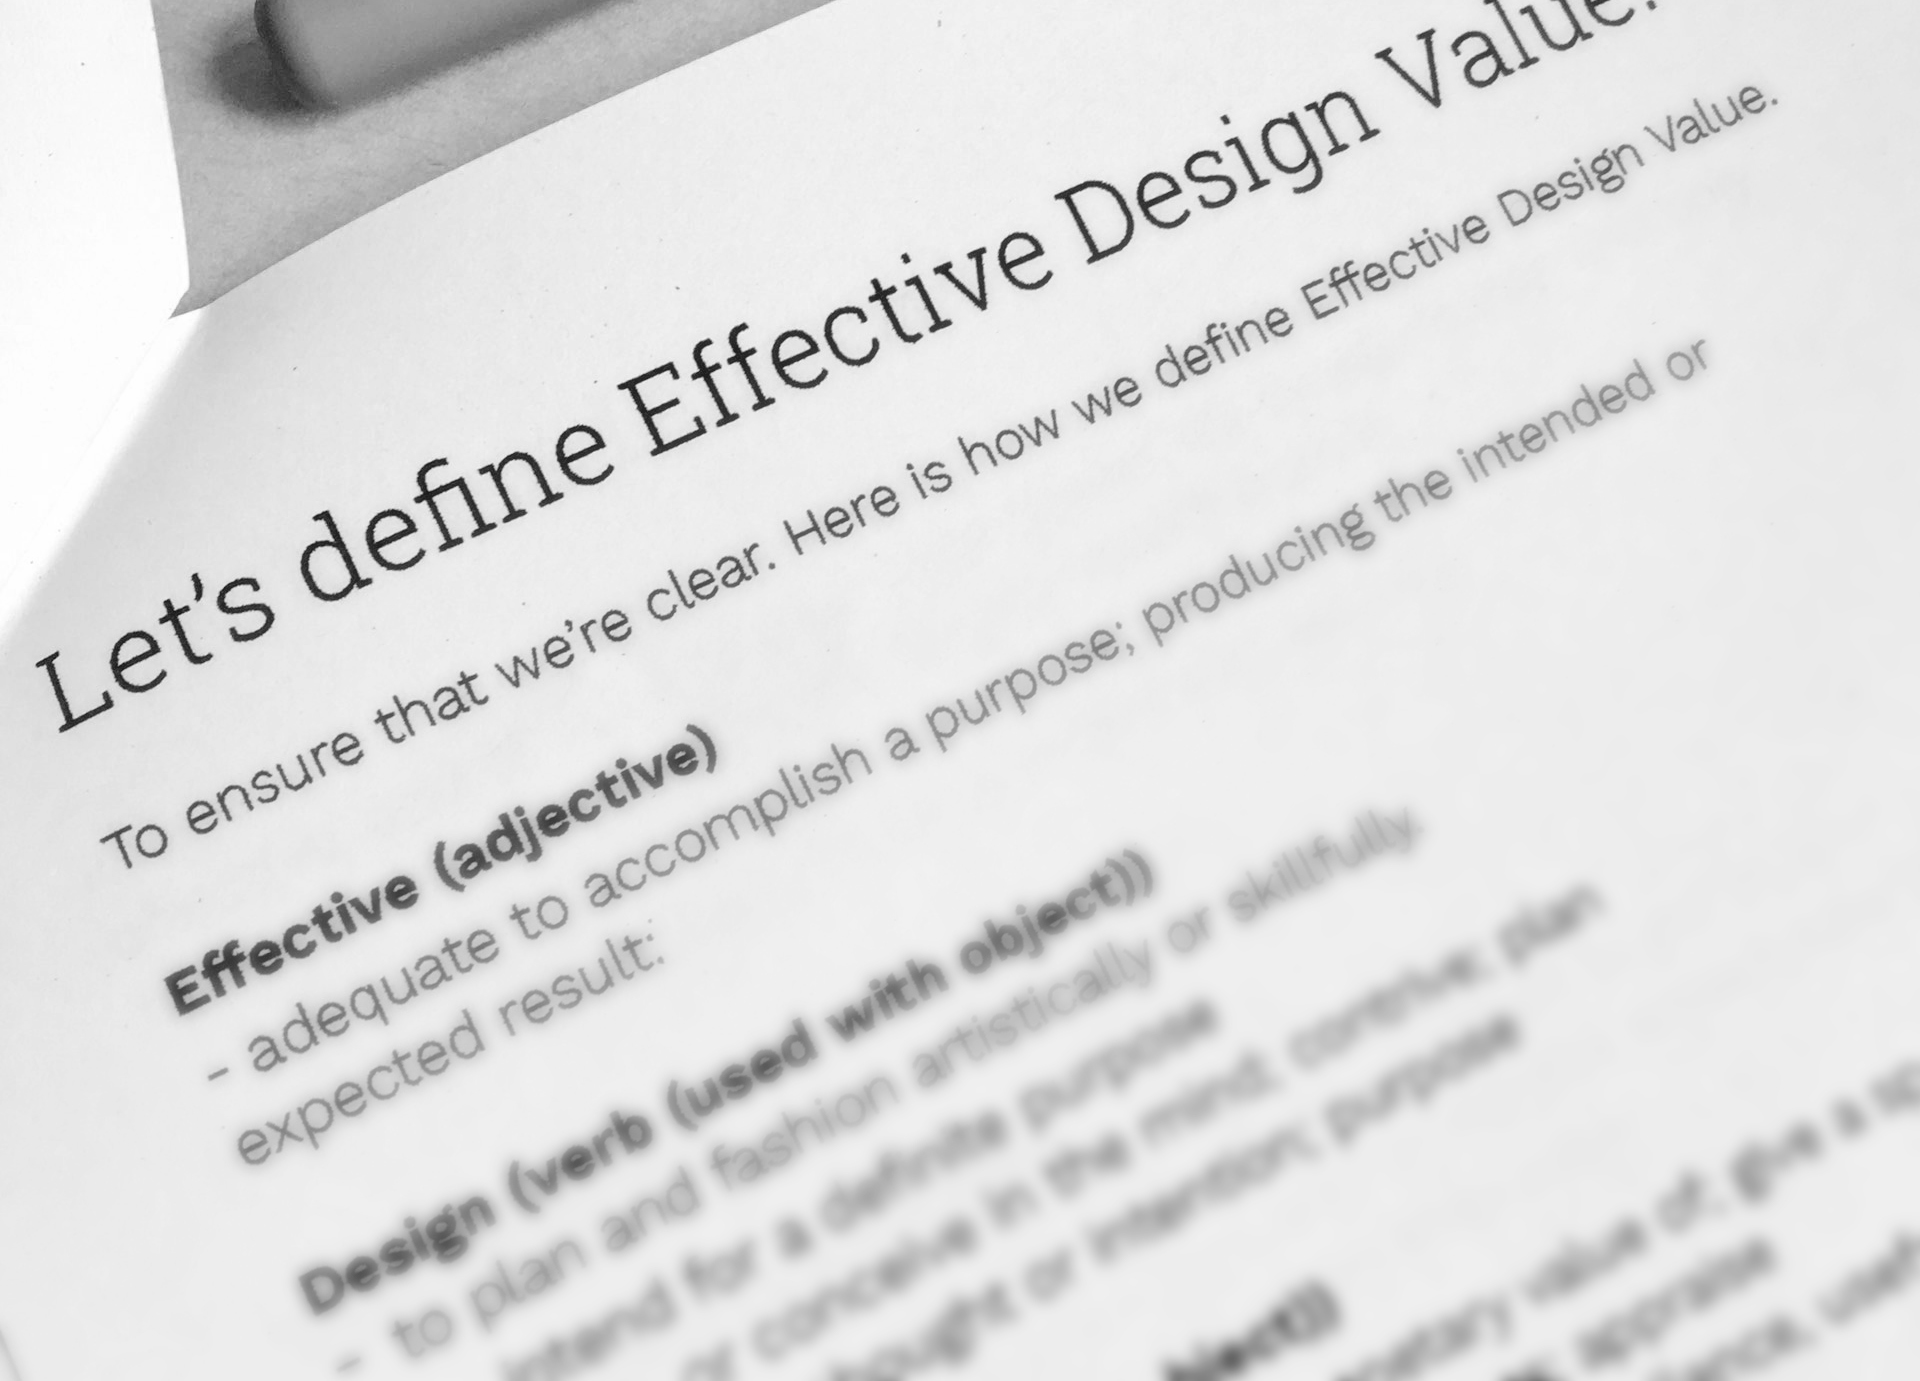 Effective Design Value